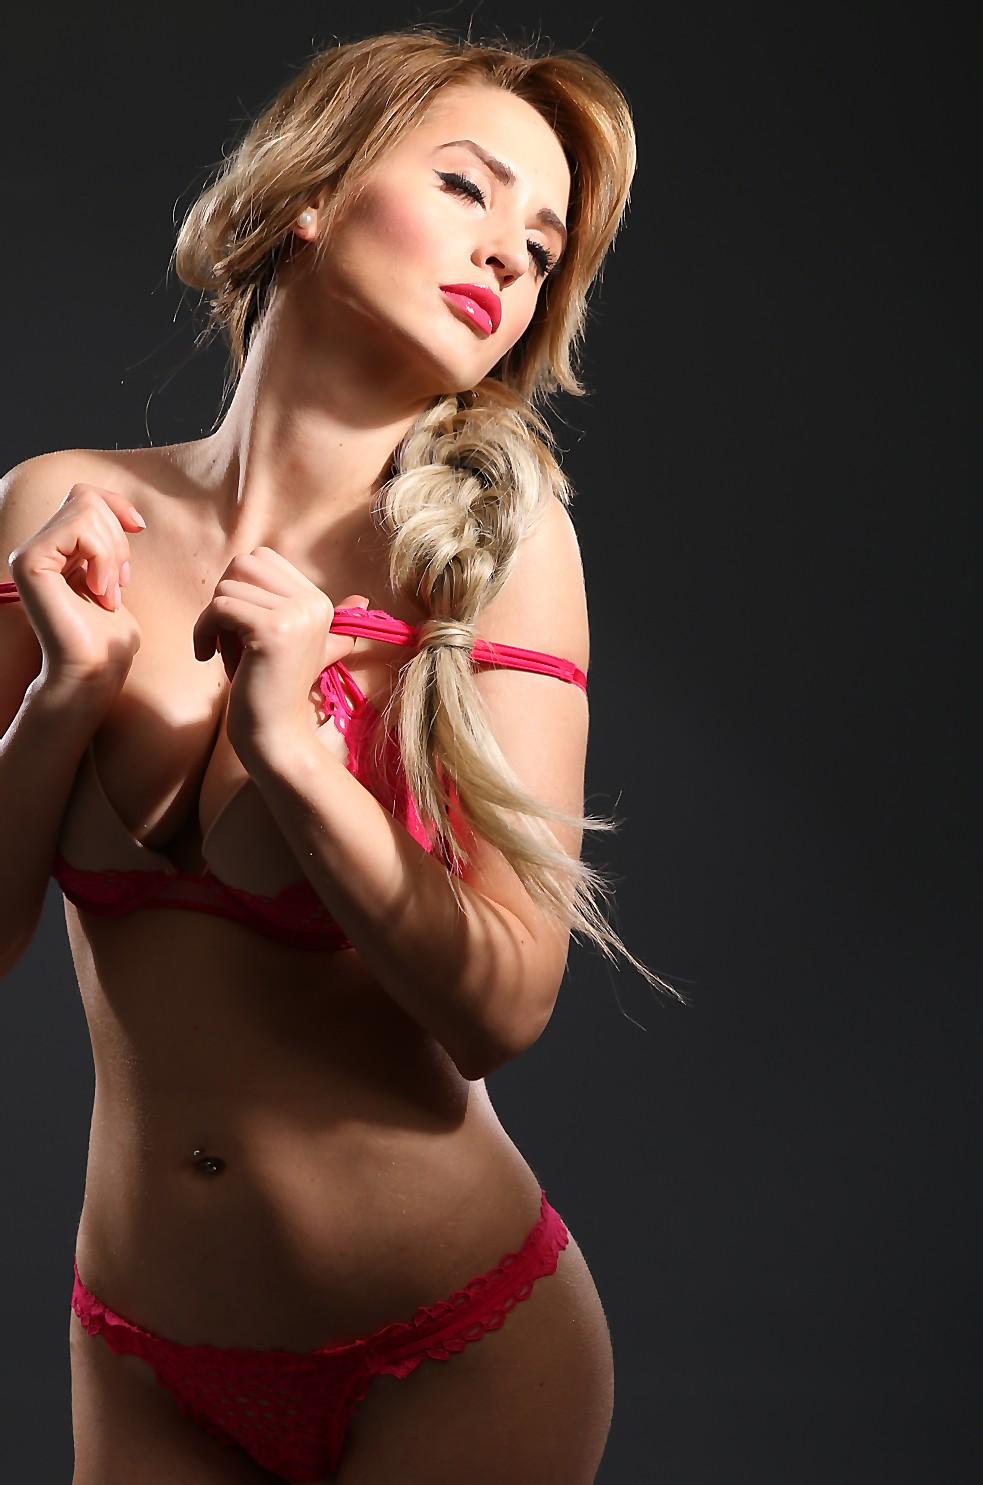 bøsse nuru massage sofia escort poland